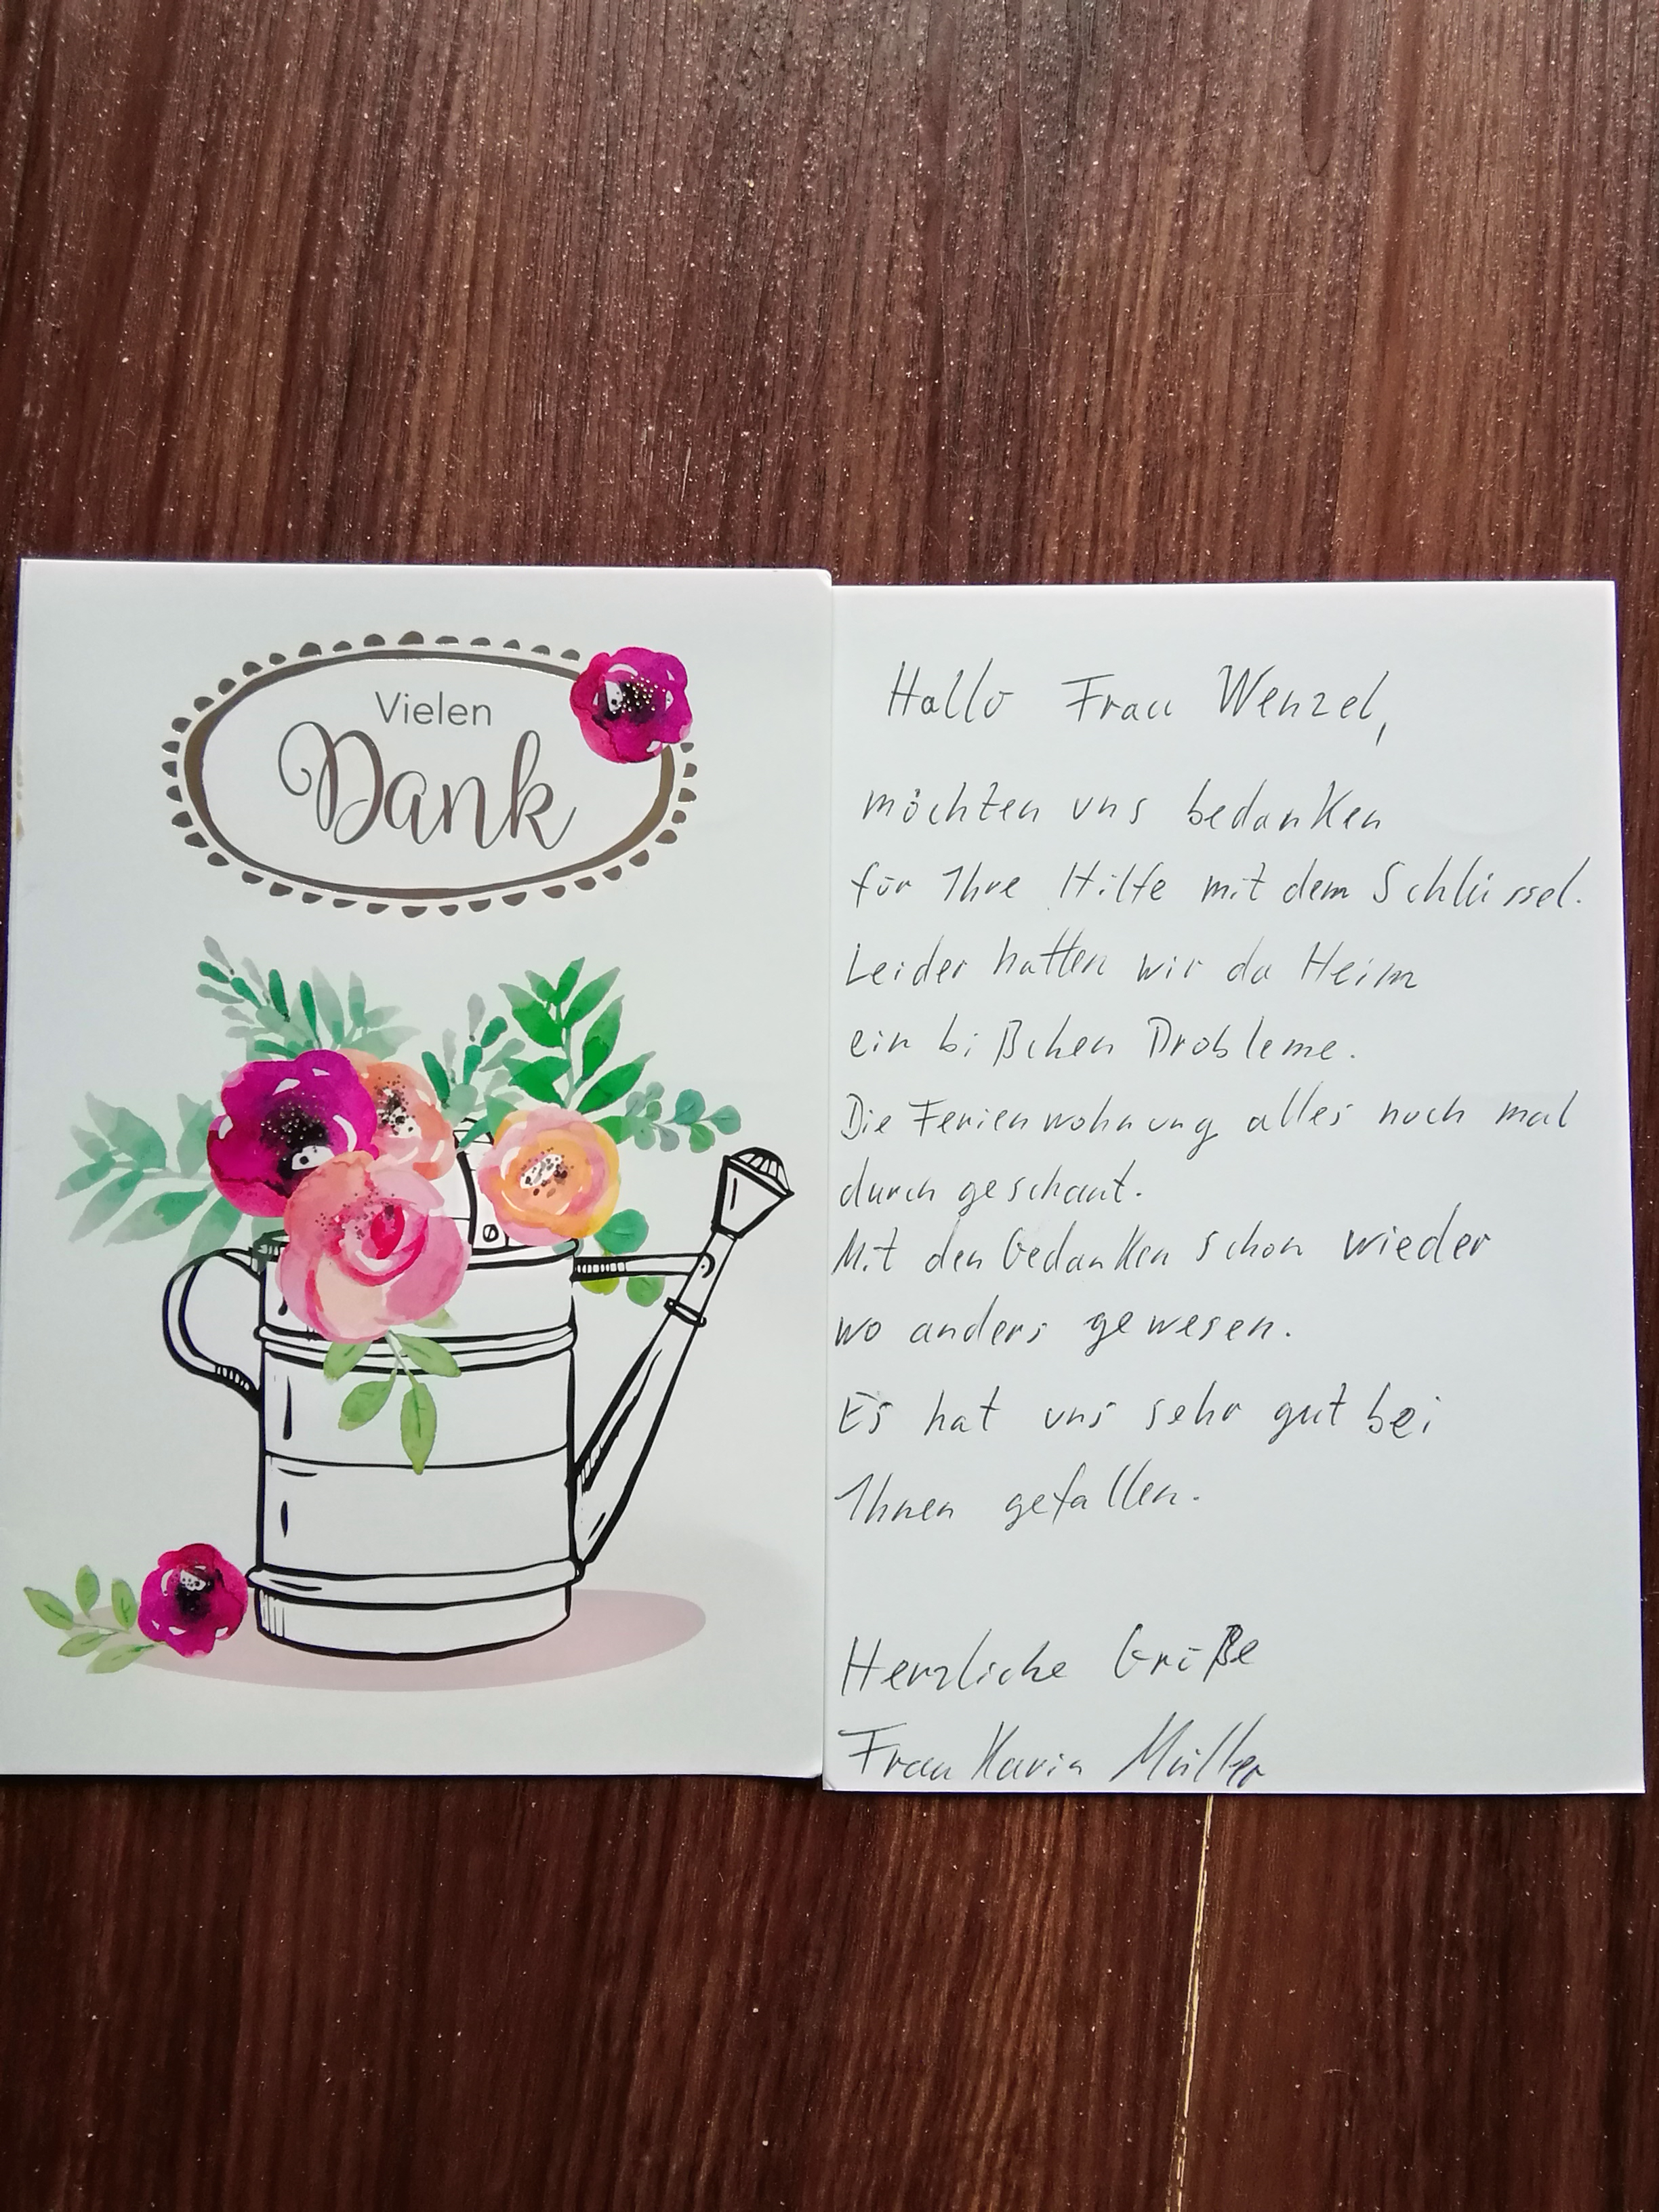 09.10.20 Postkarte nach Aufenthalt Fewo